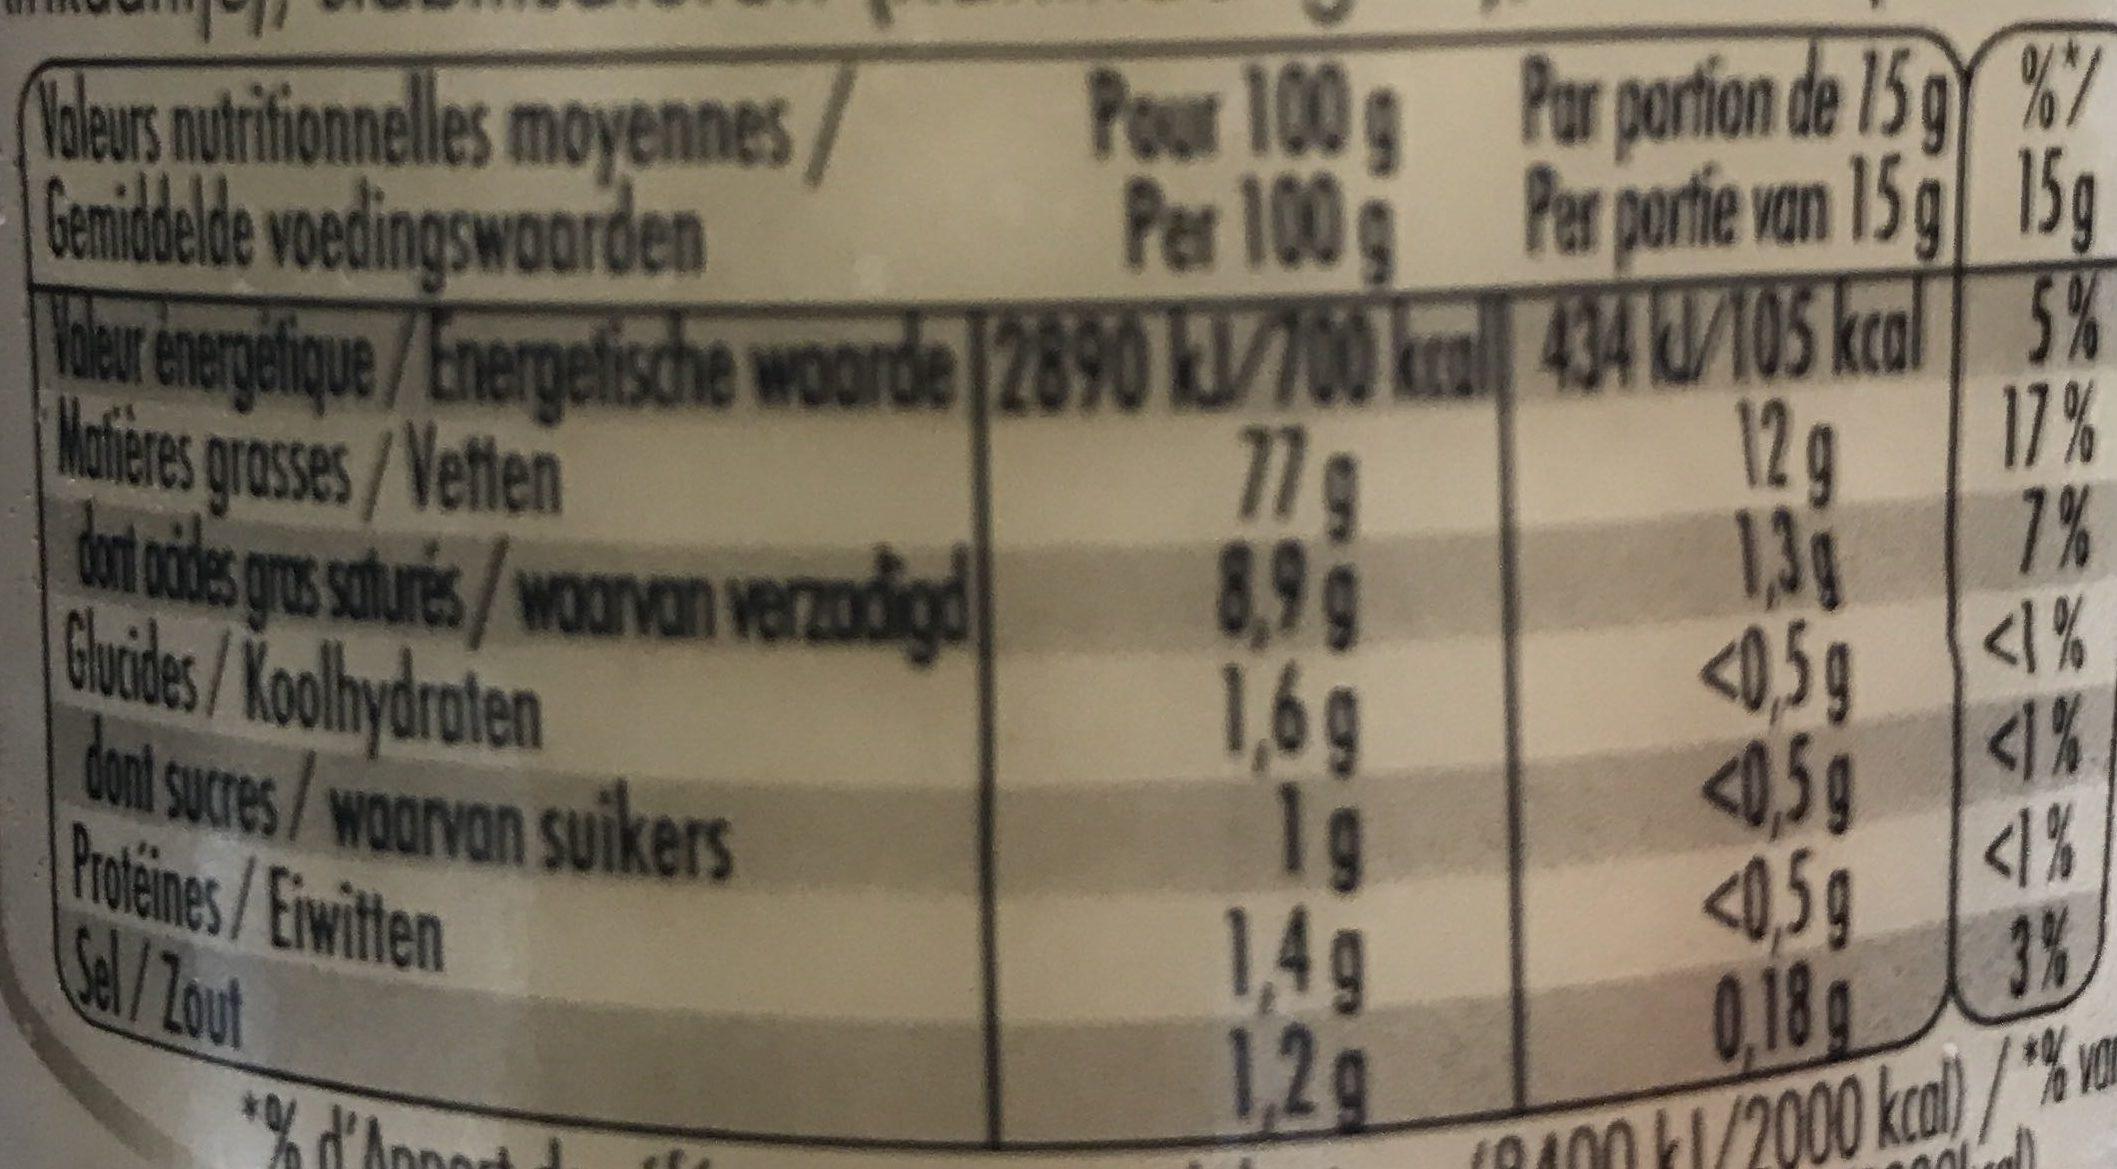 Maille Mayonnaise Fine Qualité Traiteur Bocal 320g - Voedingswaarden - fr